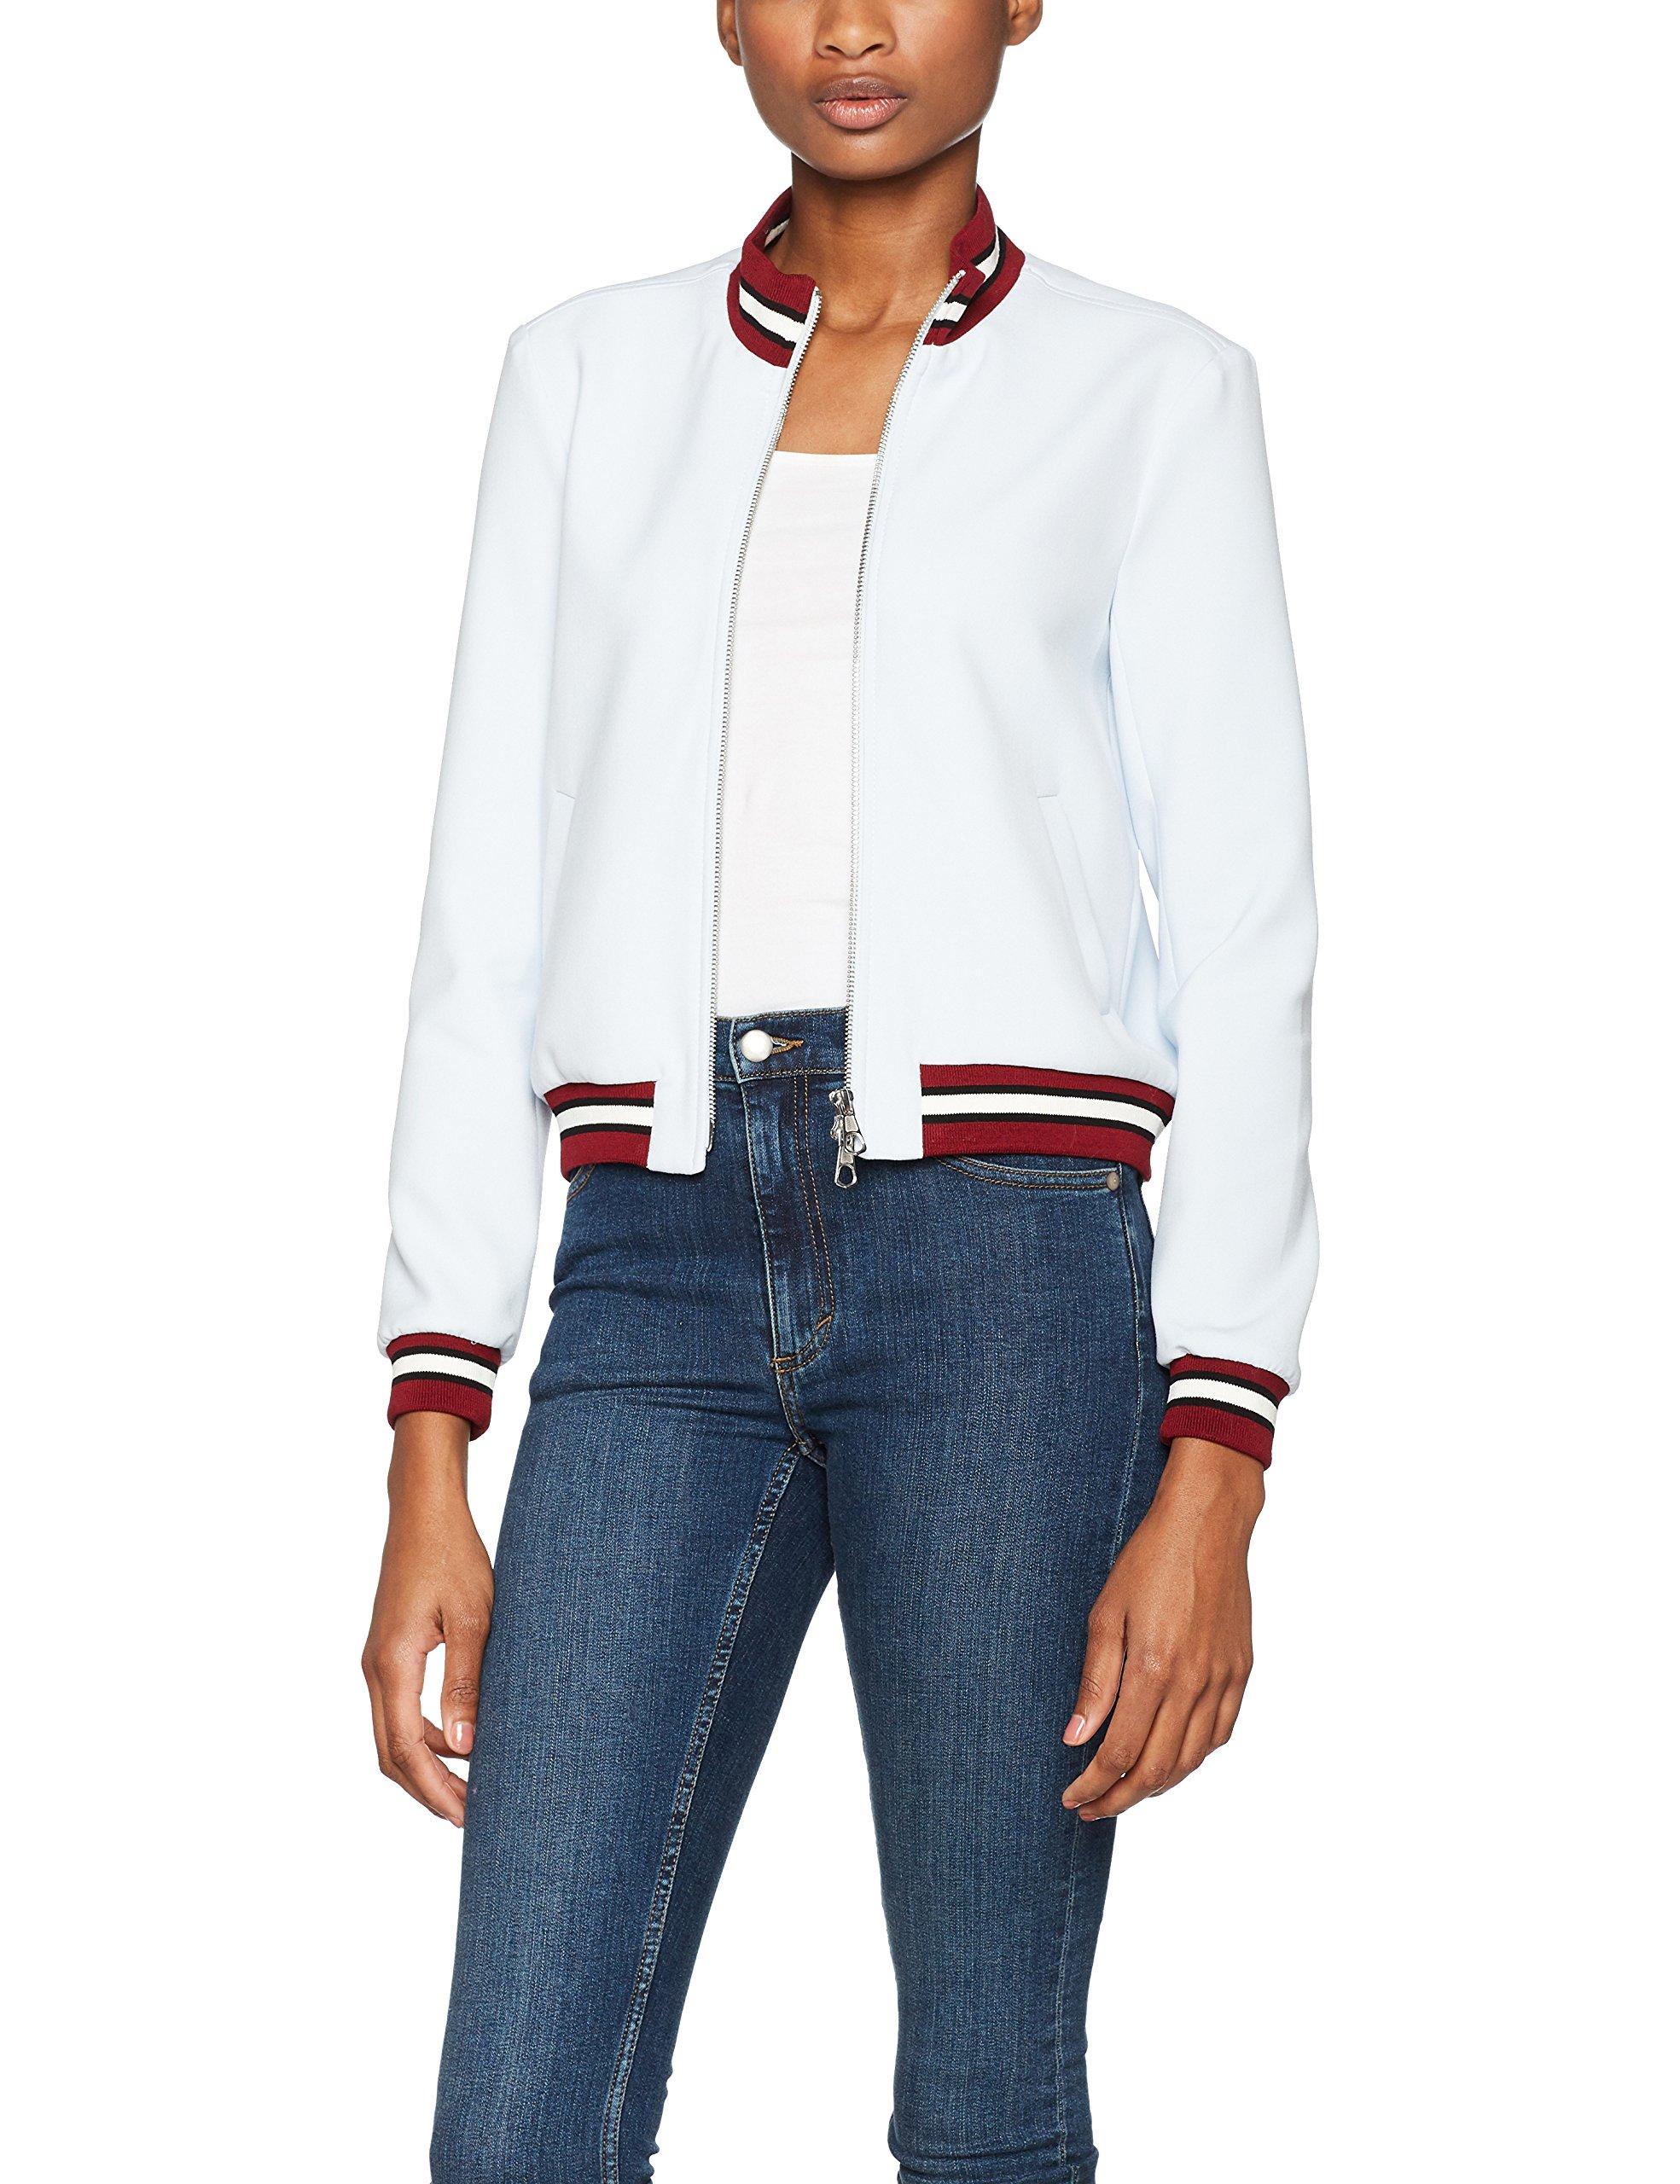 jacket Jacke Set 504242 BlousonMulticoloreplein Femme Air CodxerB